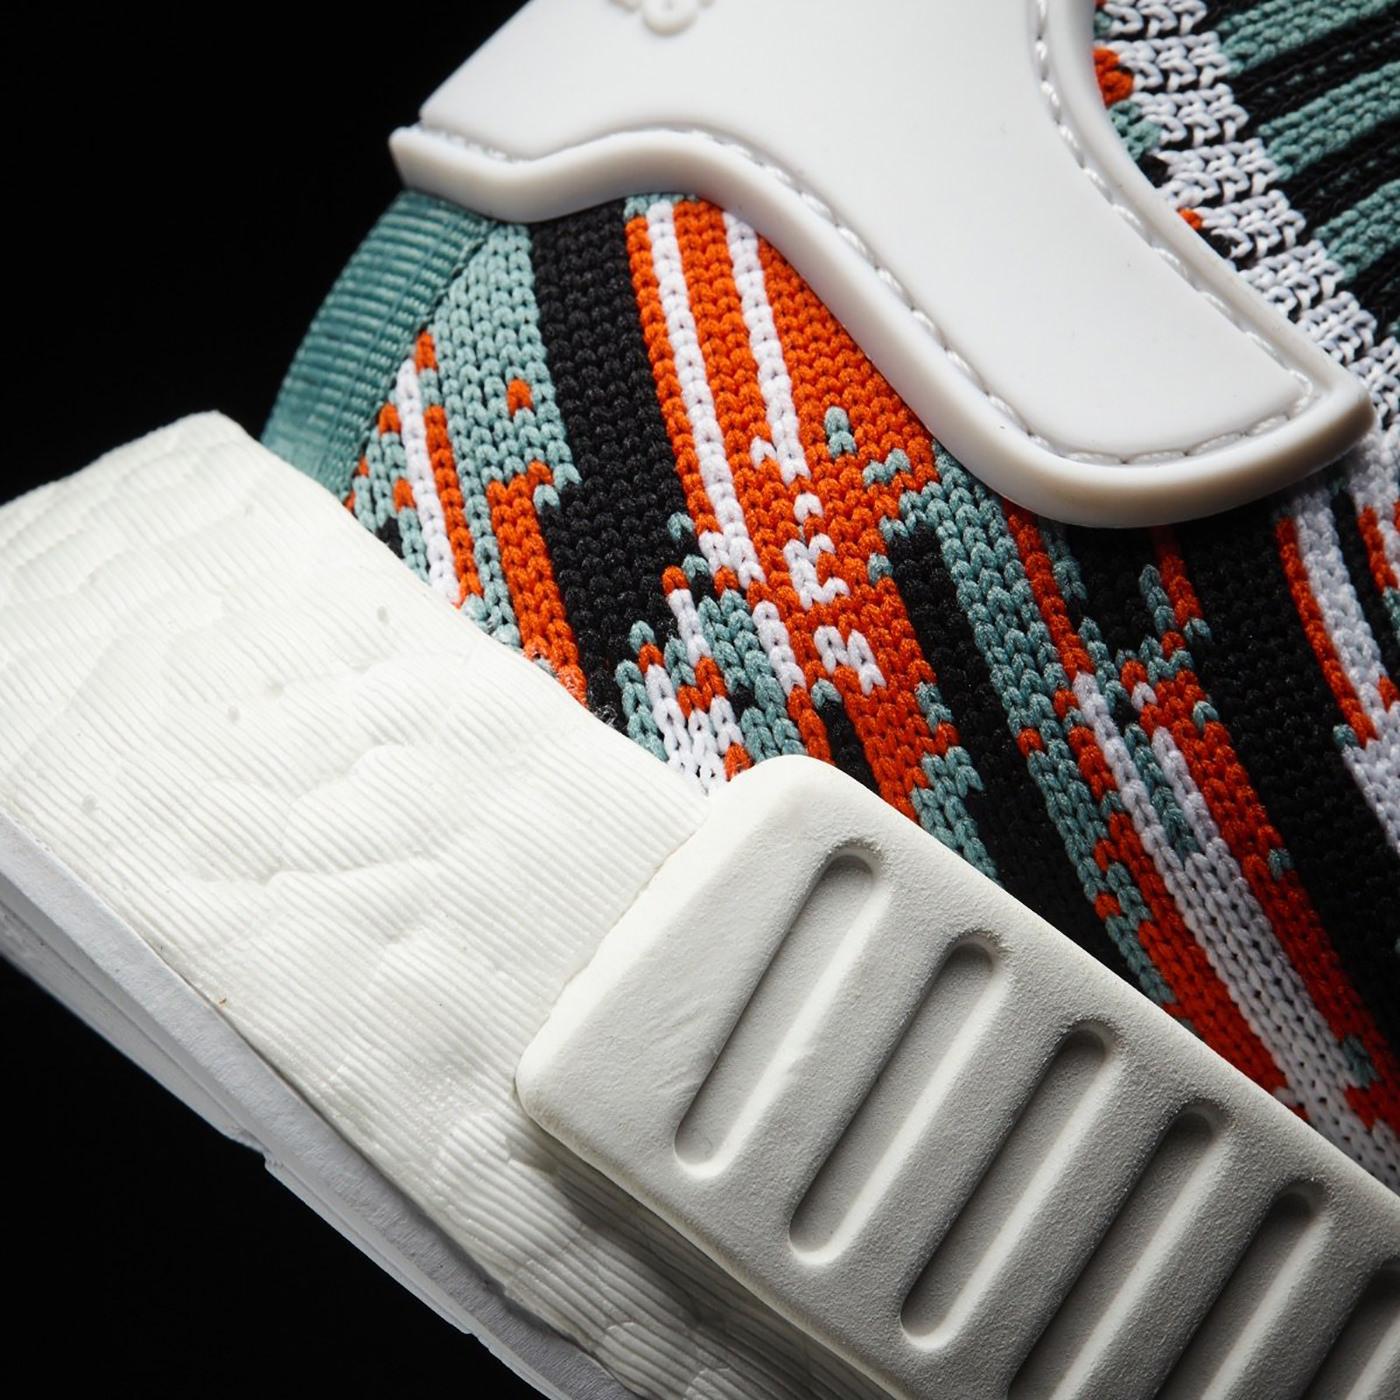 adidas-NMD_R1-PK-Gucci-1